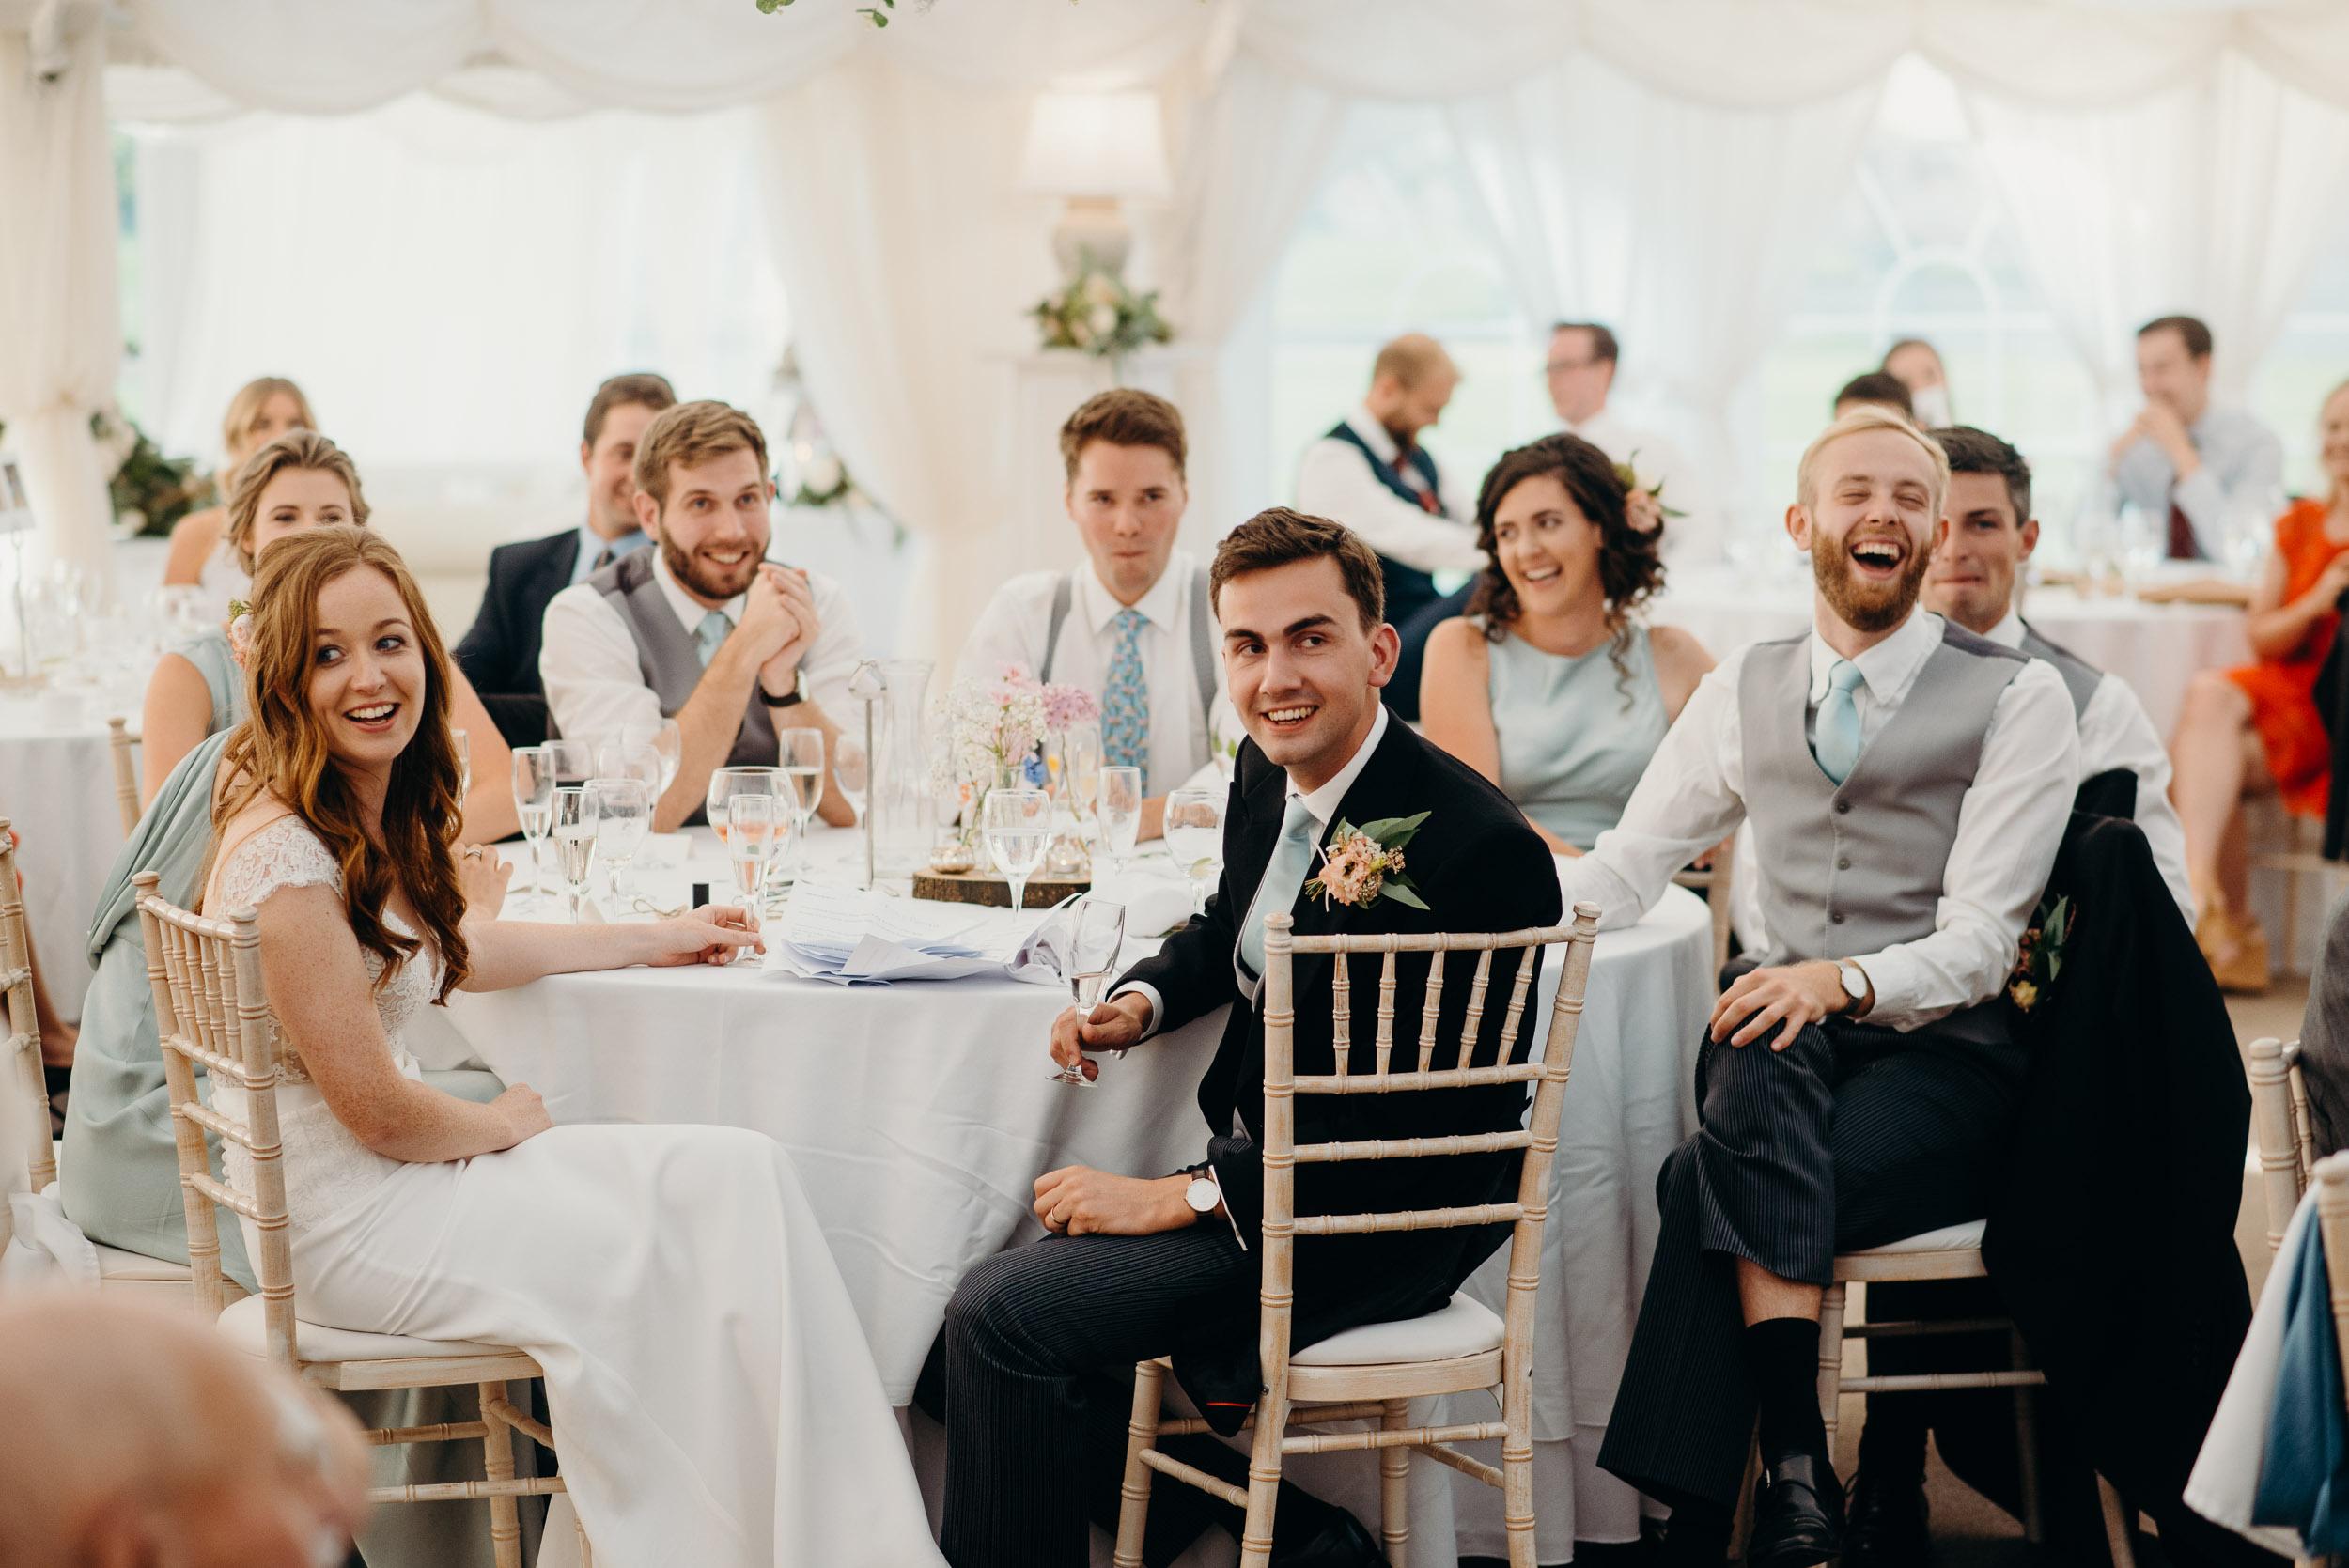 drenagh estate wedding photography-114.jpg